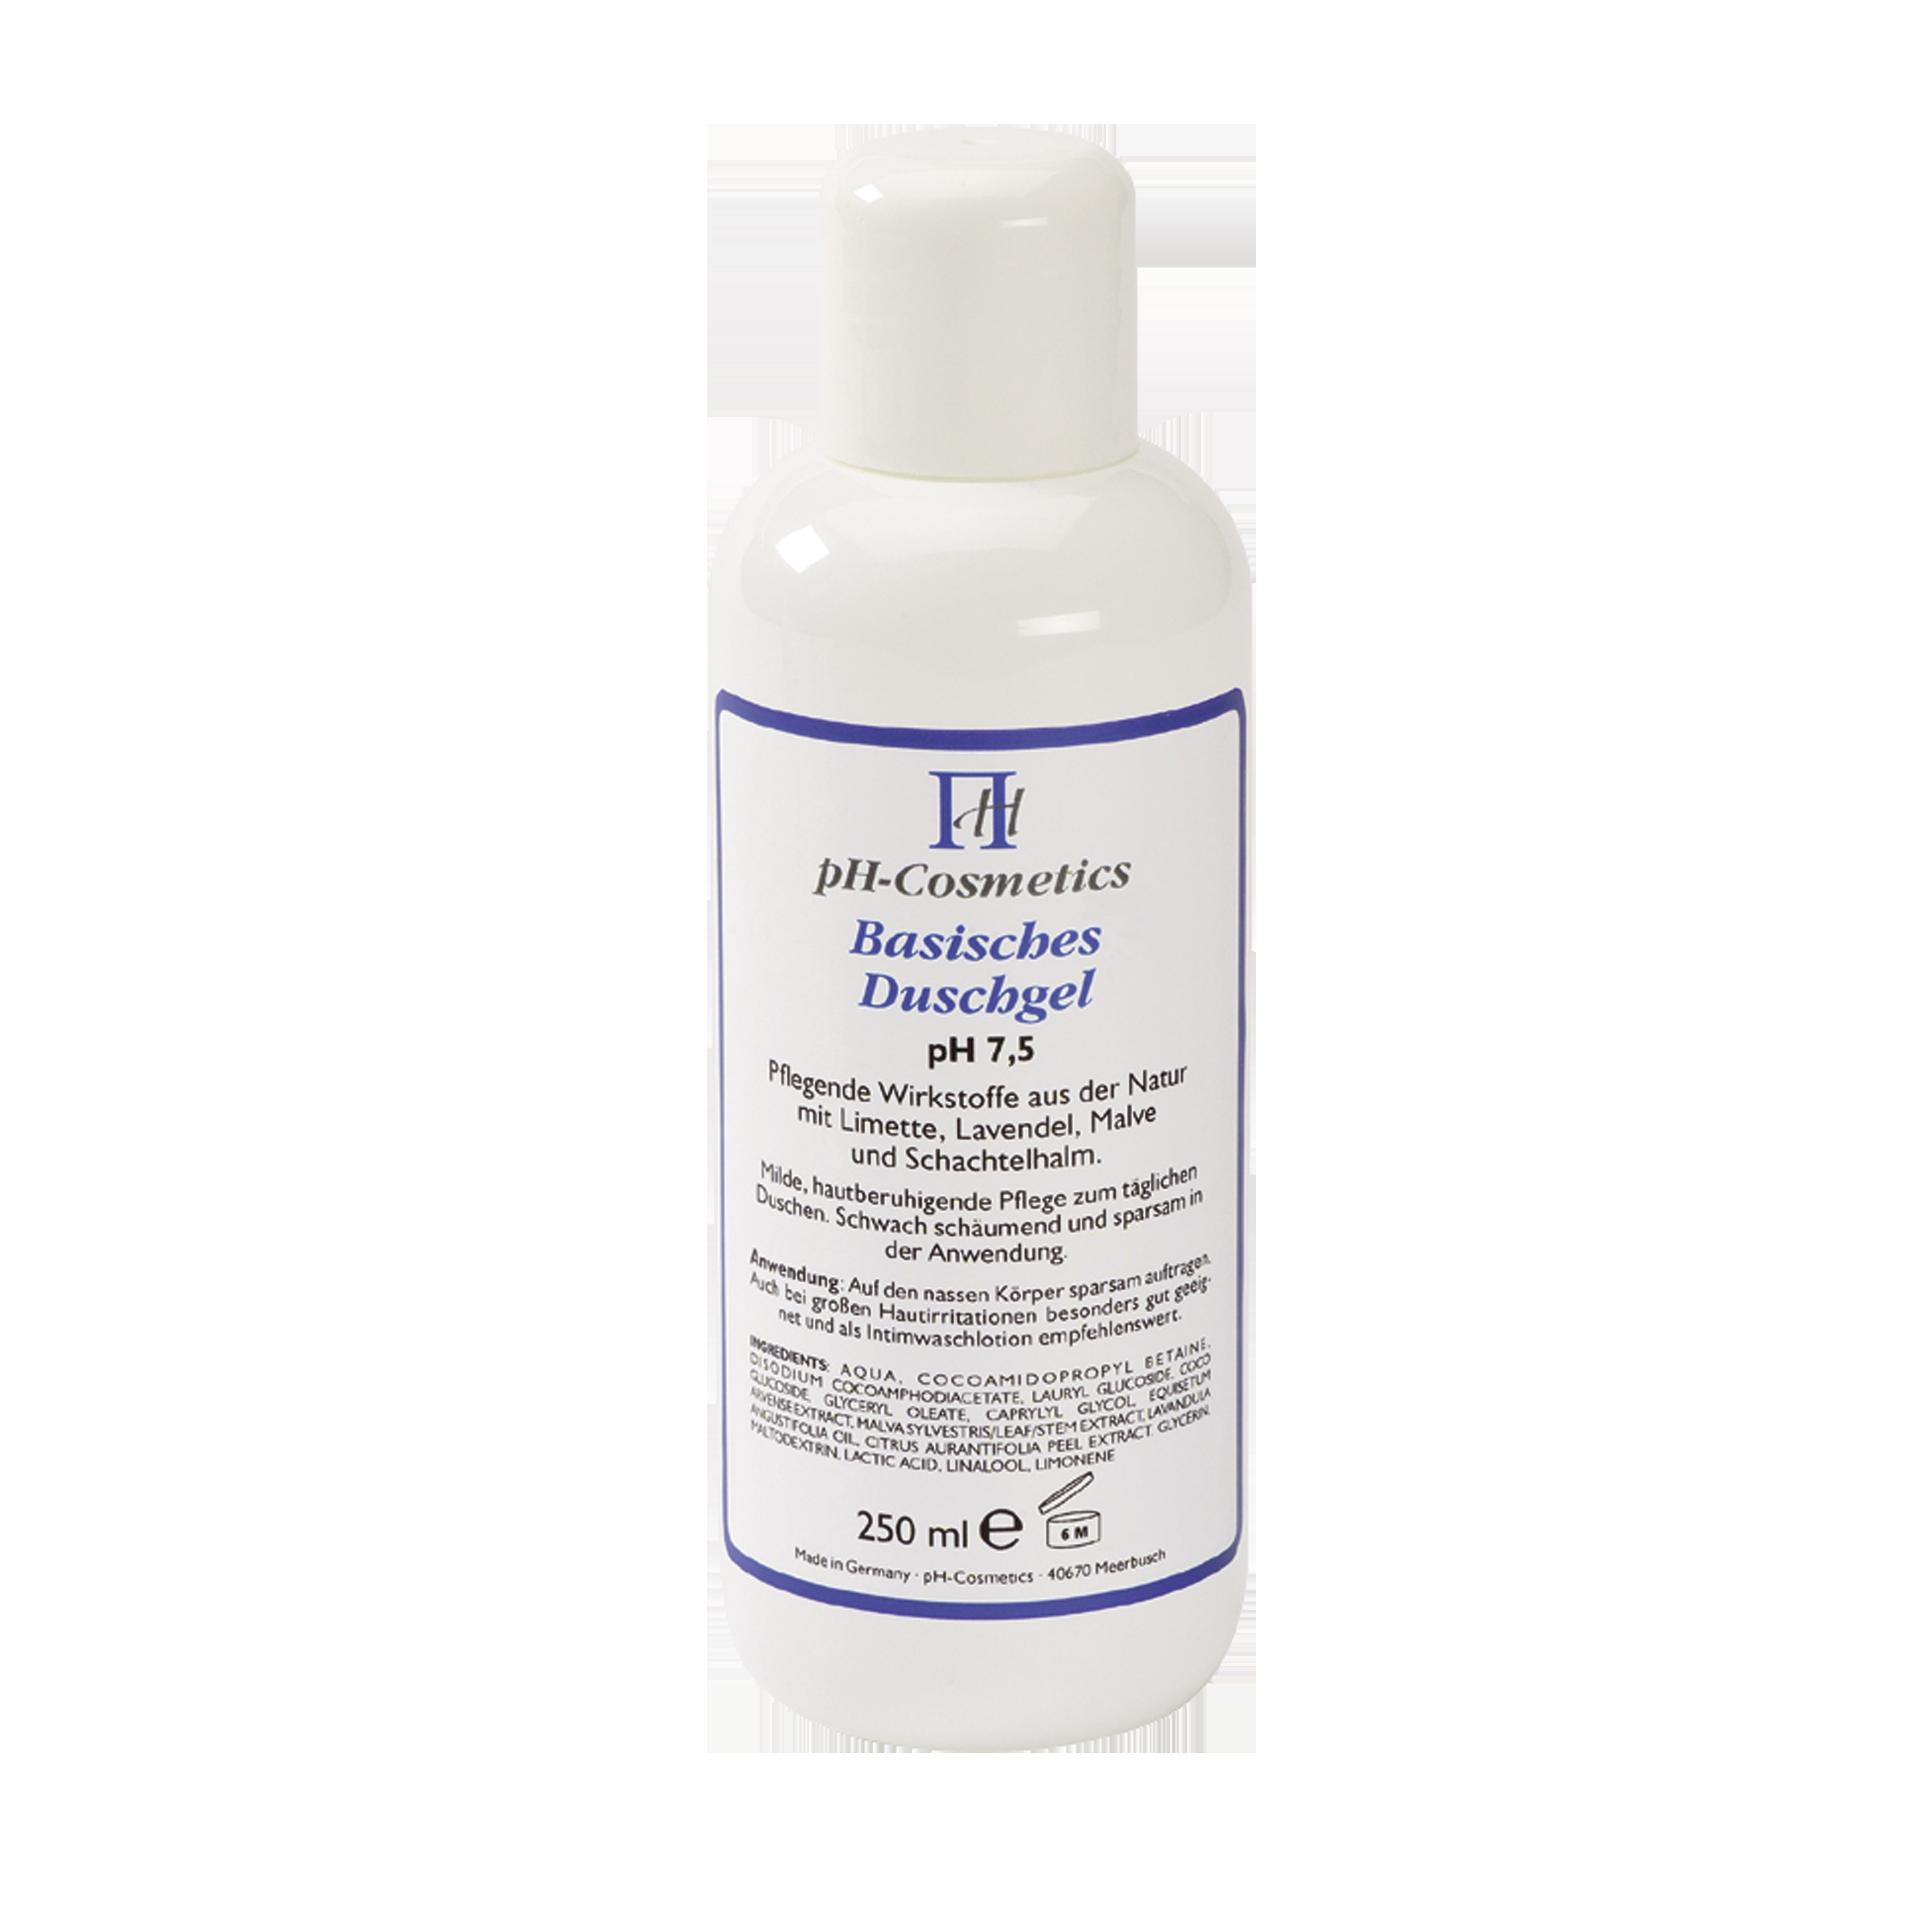 pH-Cosmetics Basisches Duschgel, pH 7.5, 250 ml